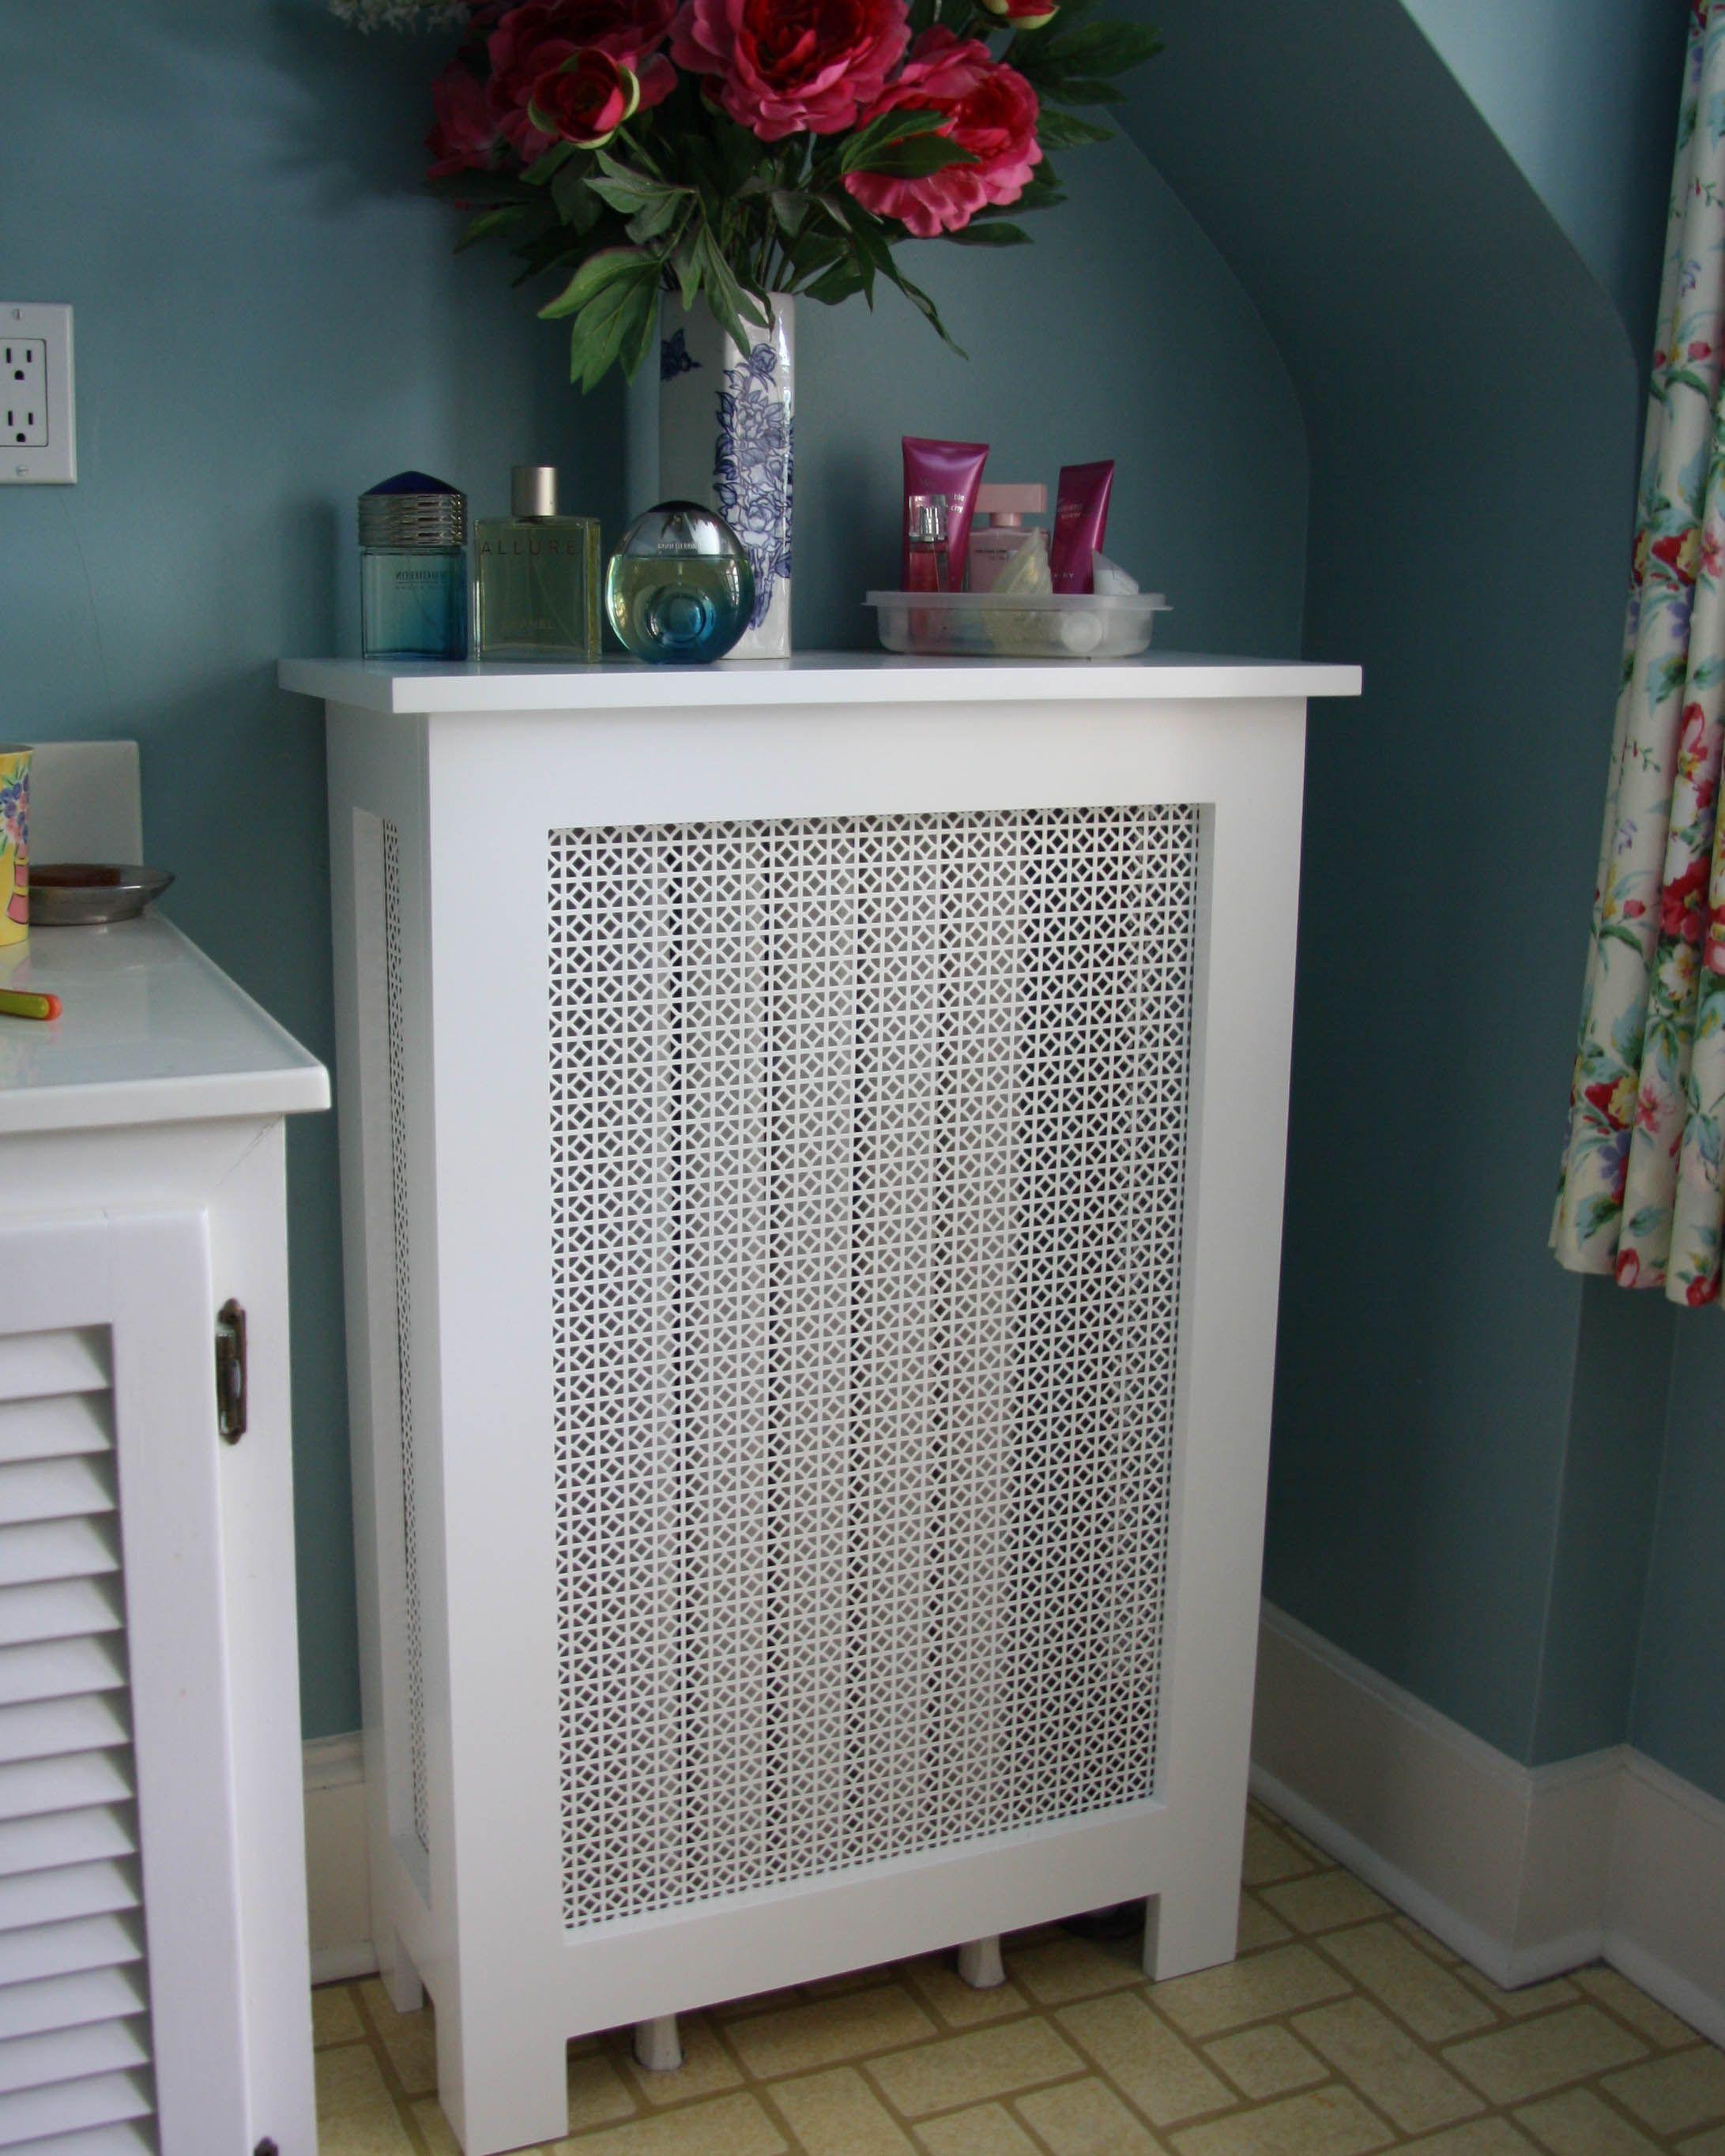 pin by fichman furniture on radiators in the bathroom on wall street journal online id=66650